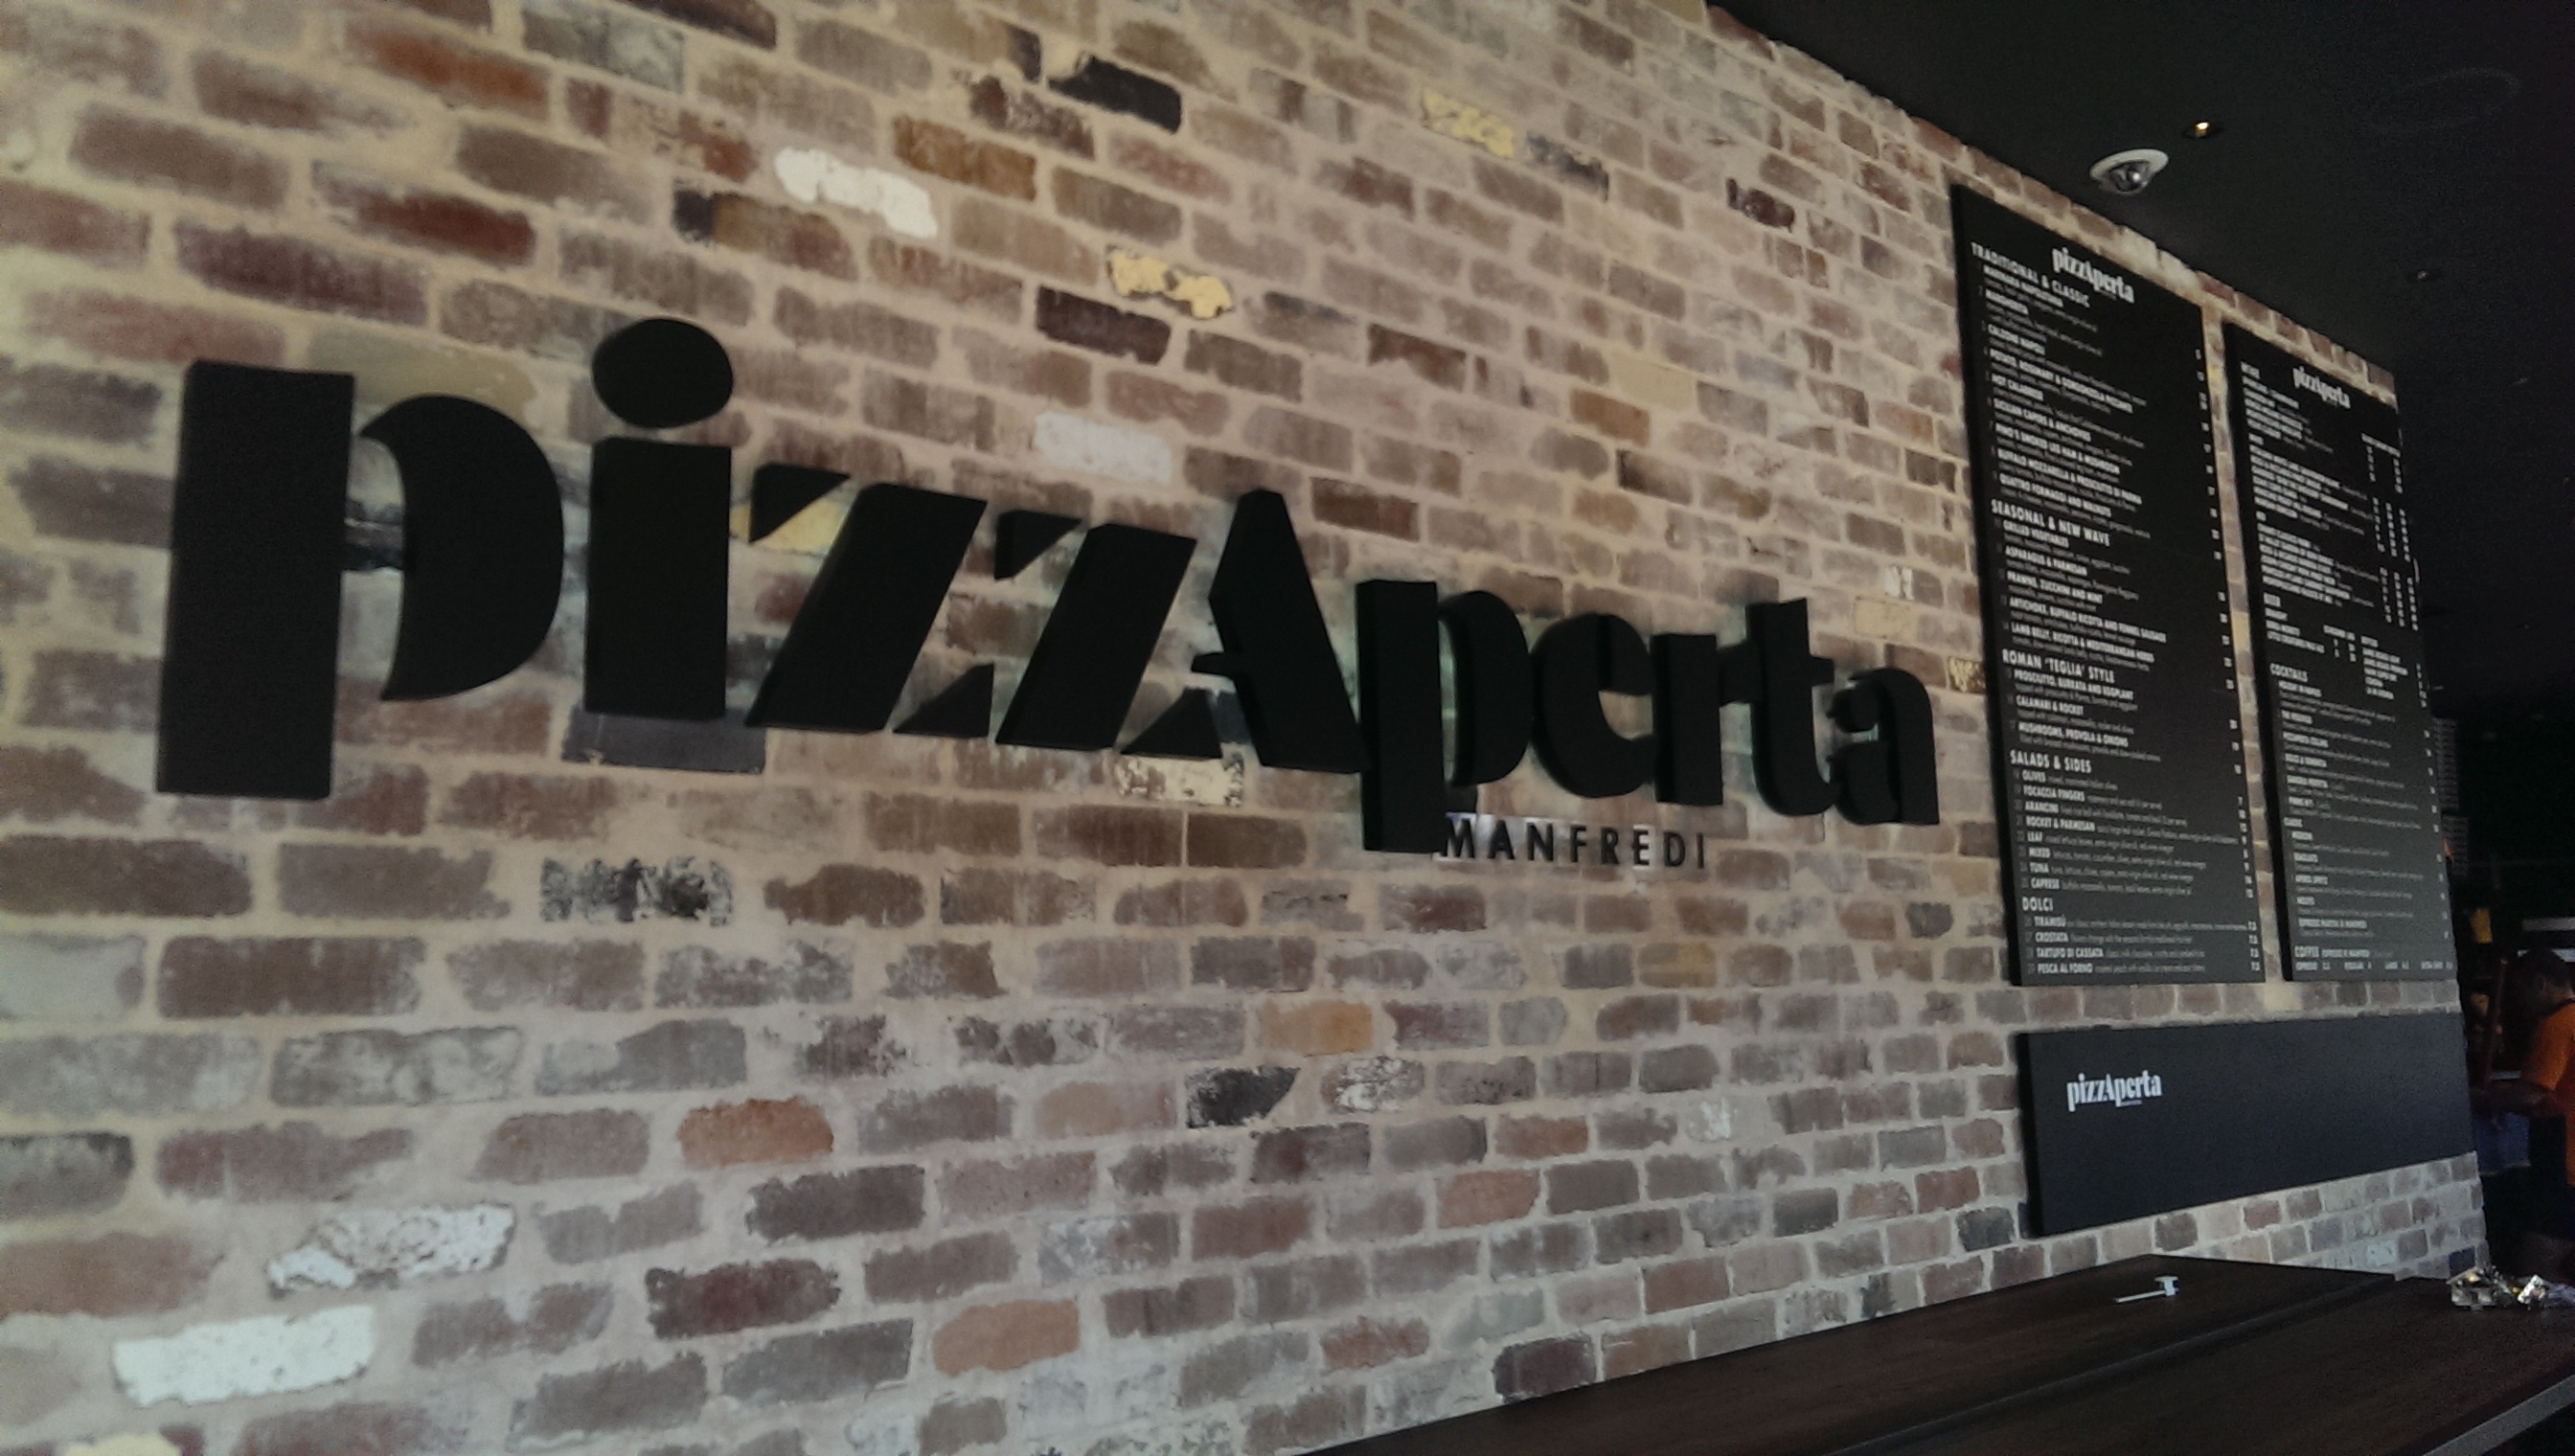 Manfredi PizzAperta Star Casino